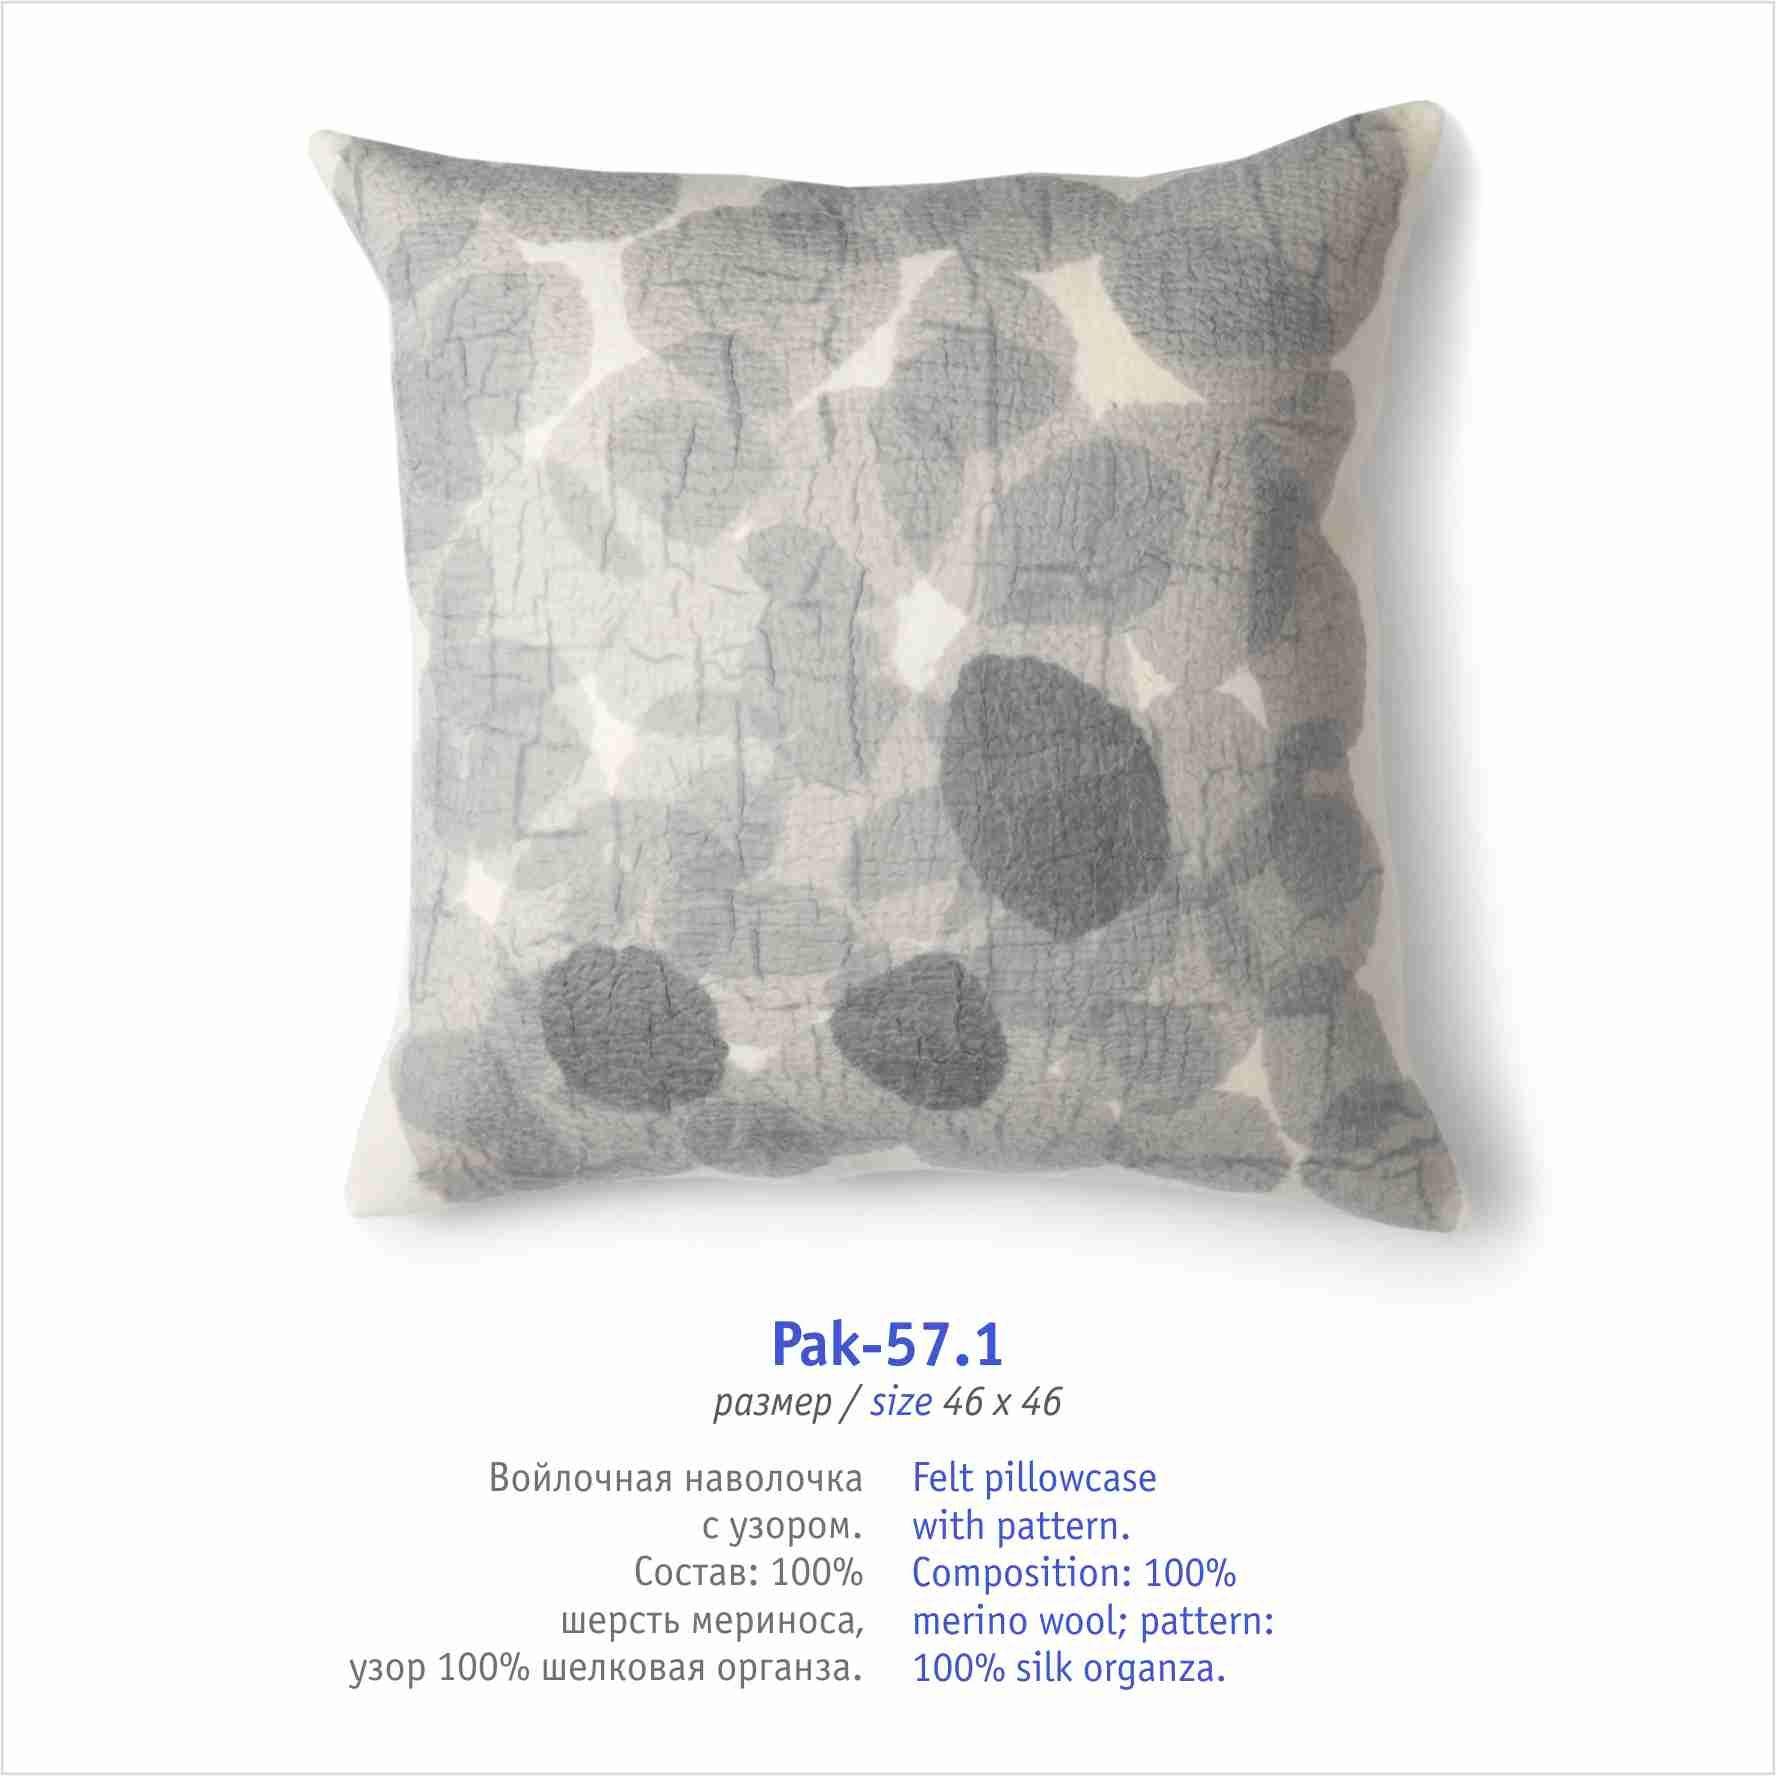 Felt pillowcase with pattern. Composition: 100% wool (merino); pattern 100% silk organza.